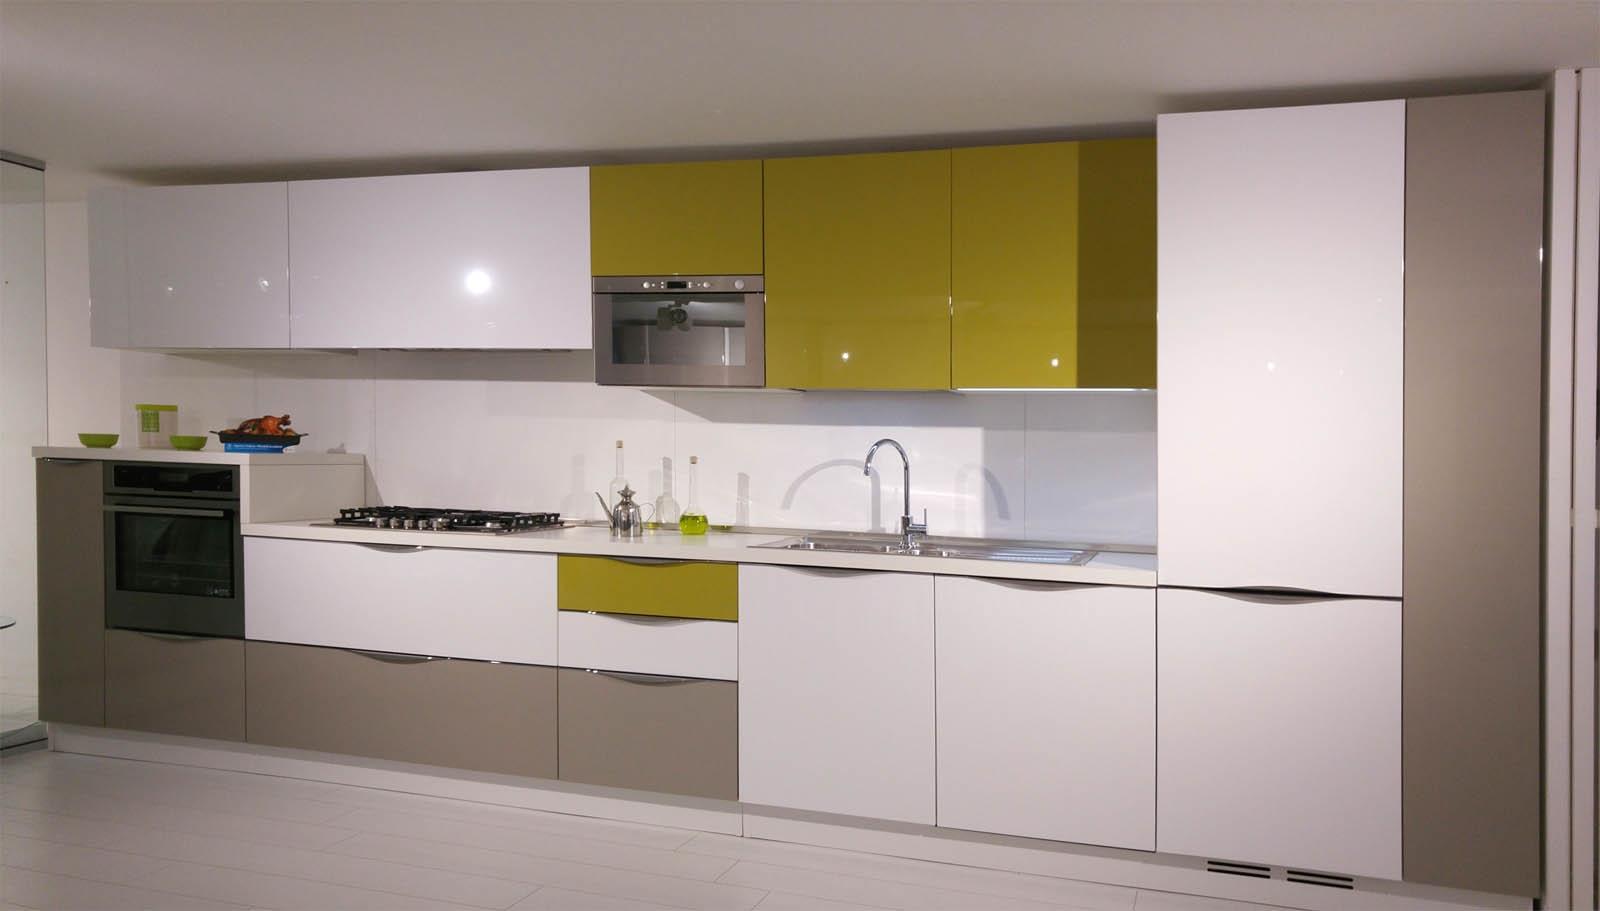 Cucina arredo 3 design polimerico lucido cucine a prezzi for Cucina arreda